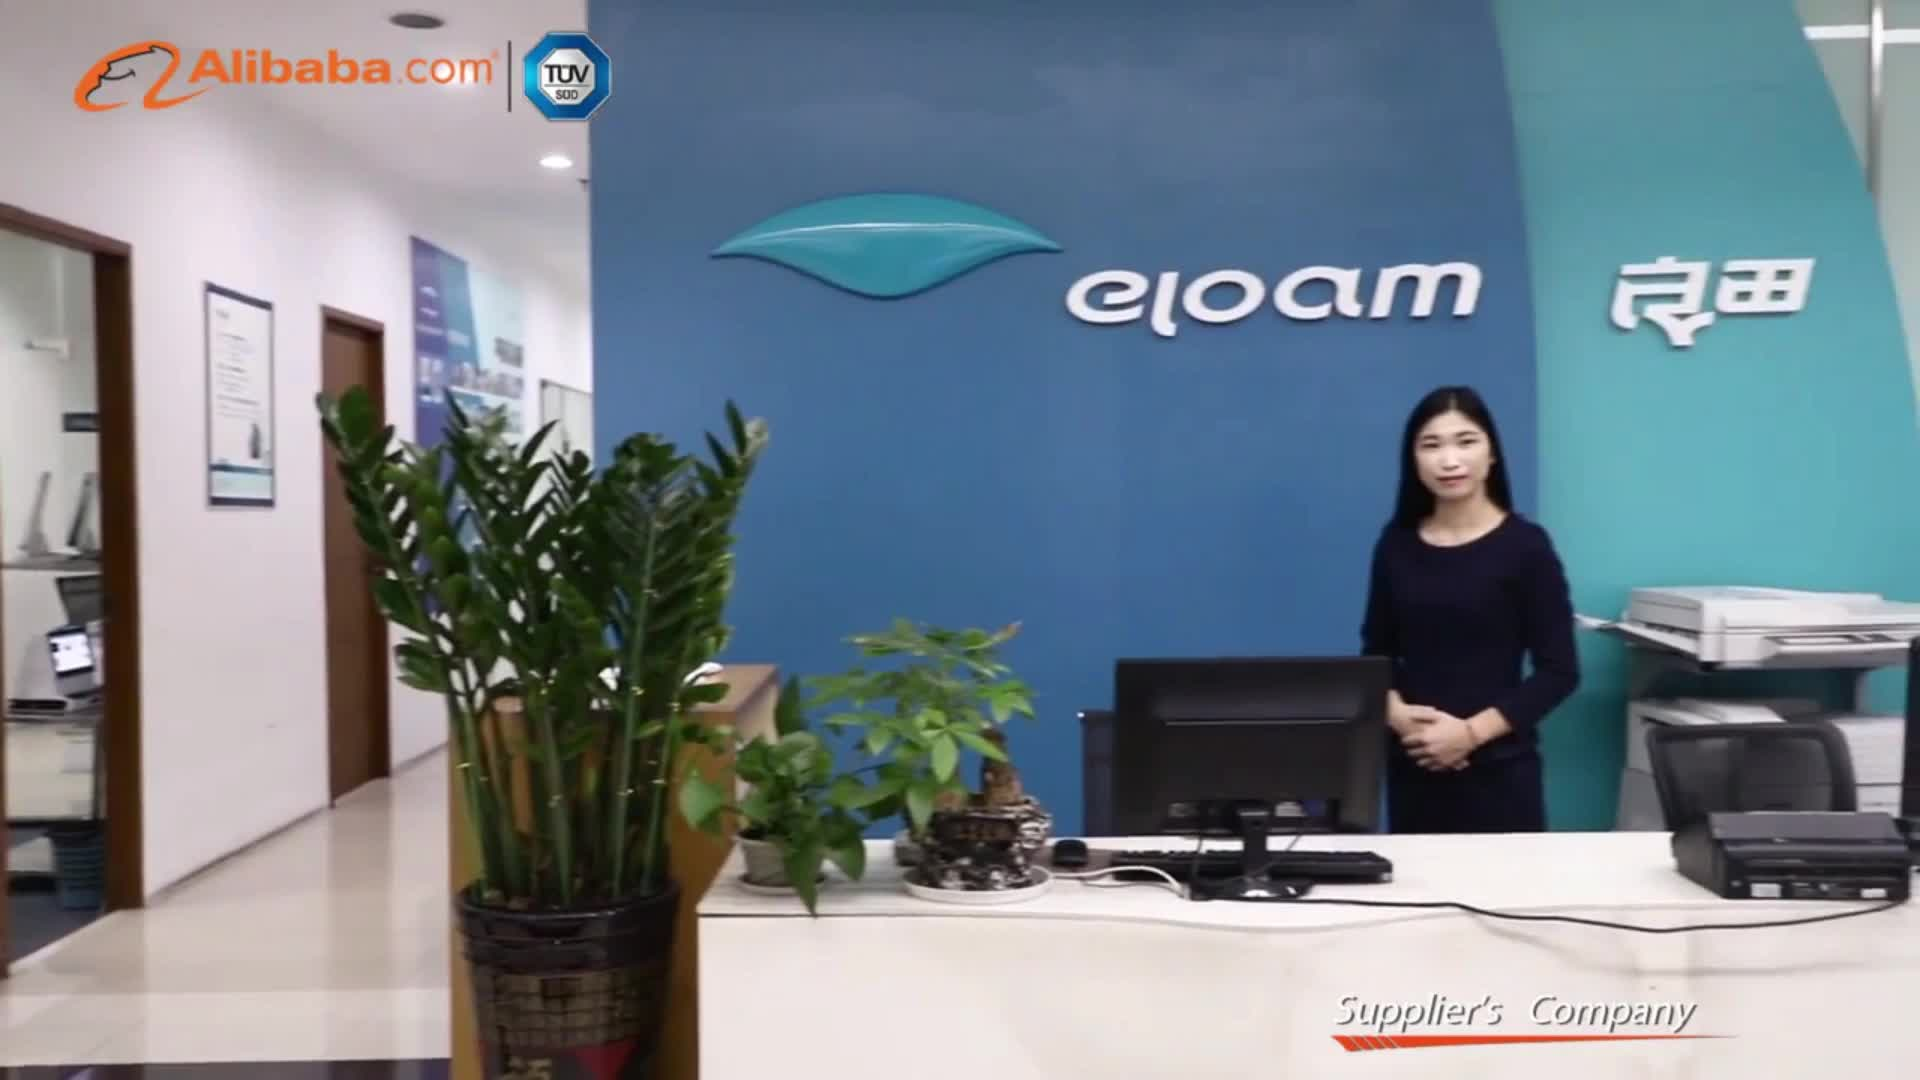 Eloam 휴대용 서 3D usb 문서 카메라 스캐너 V520